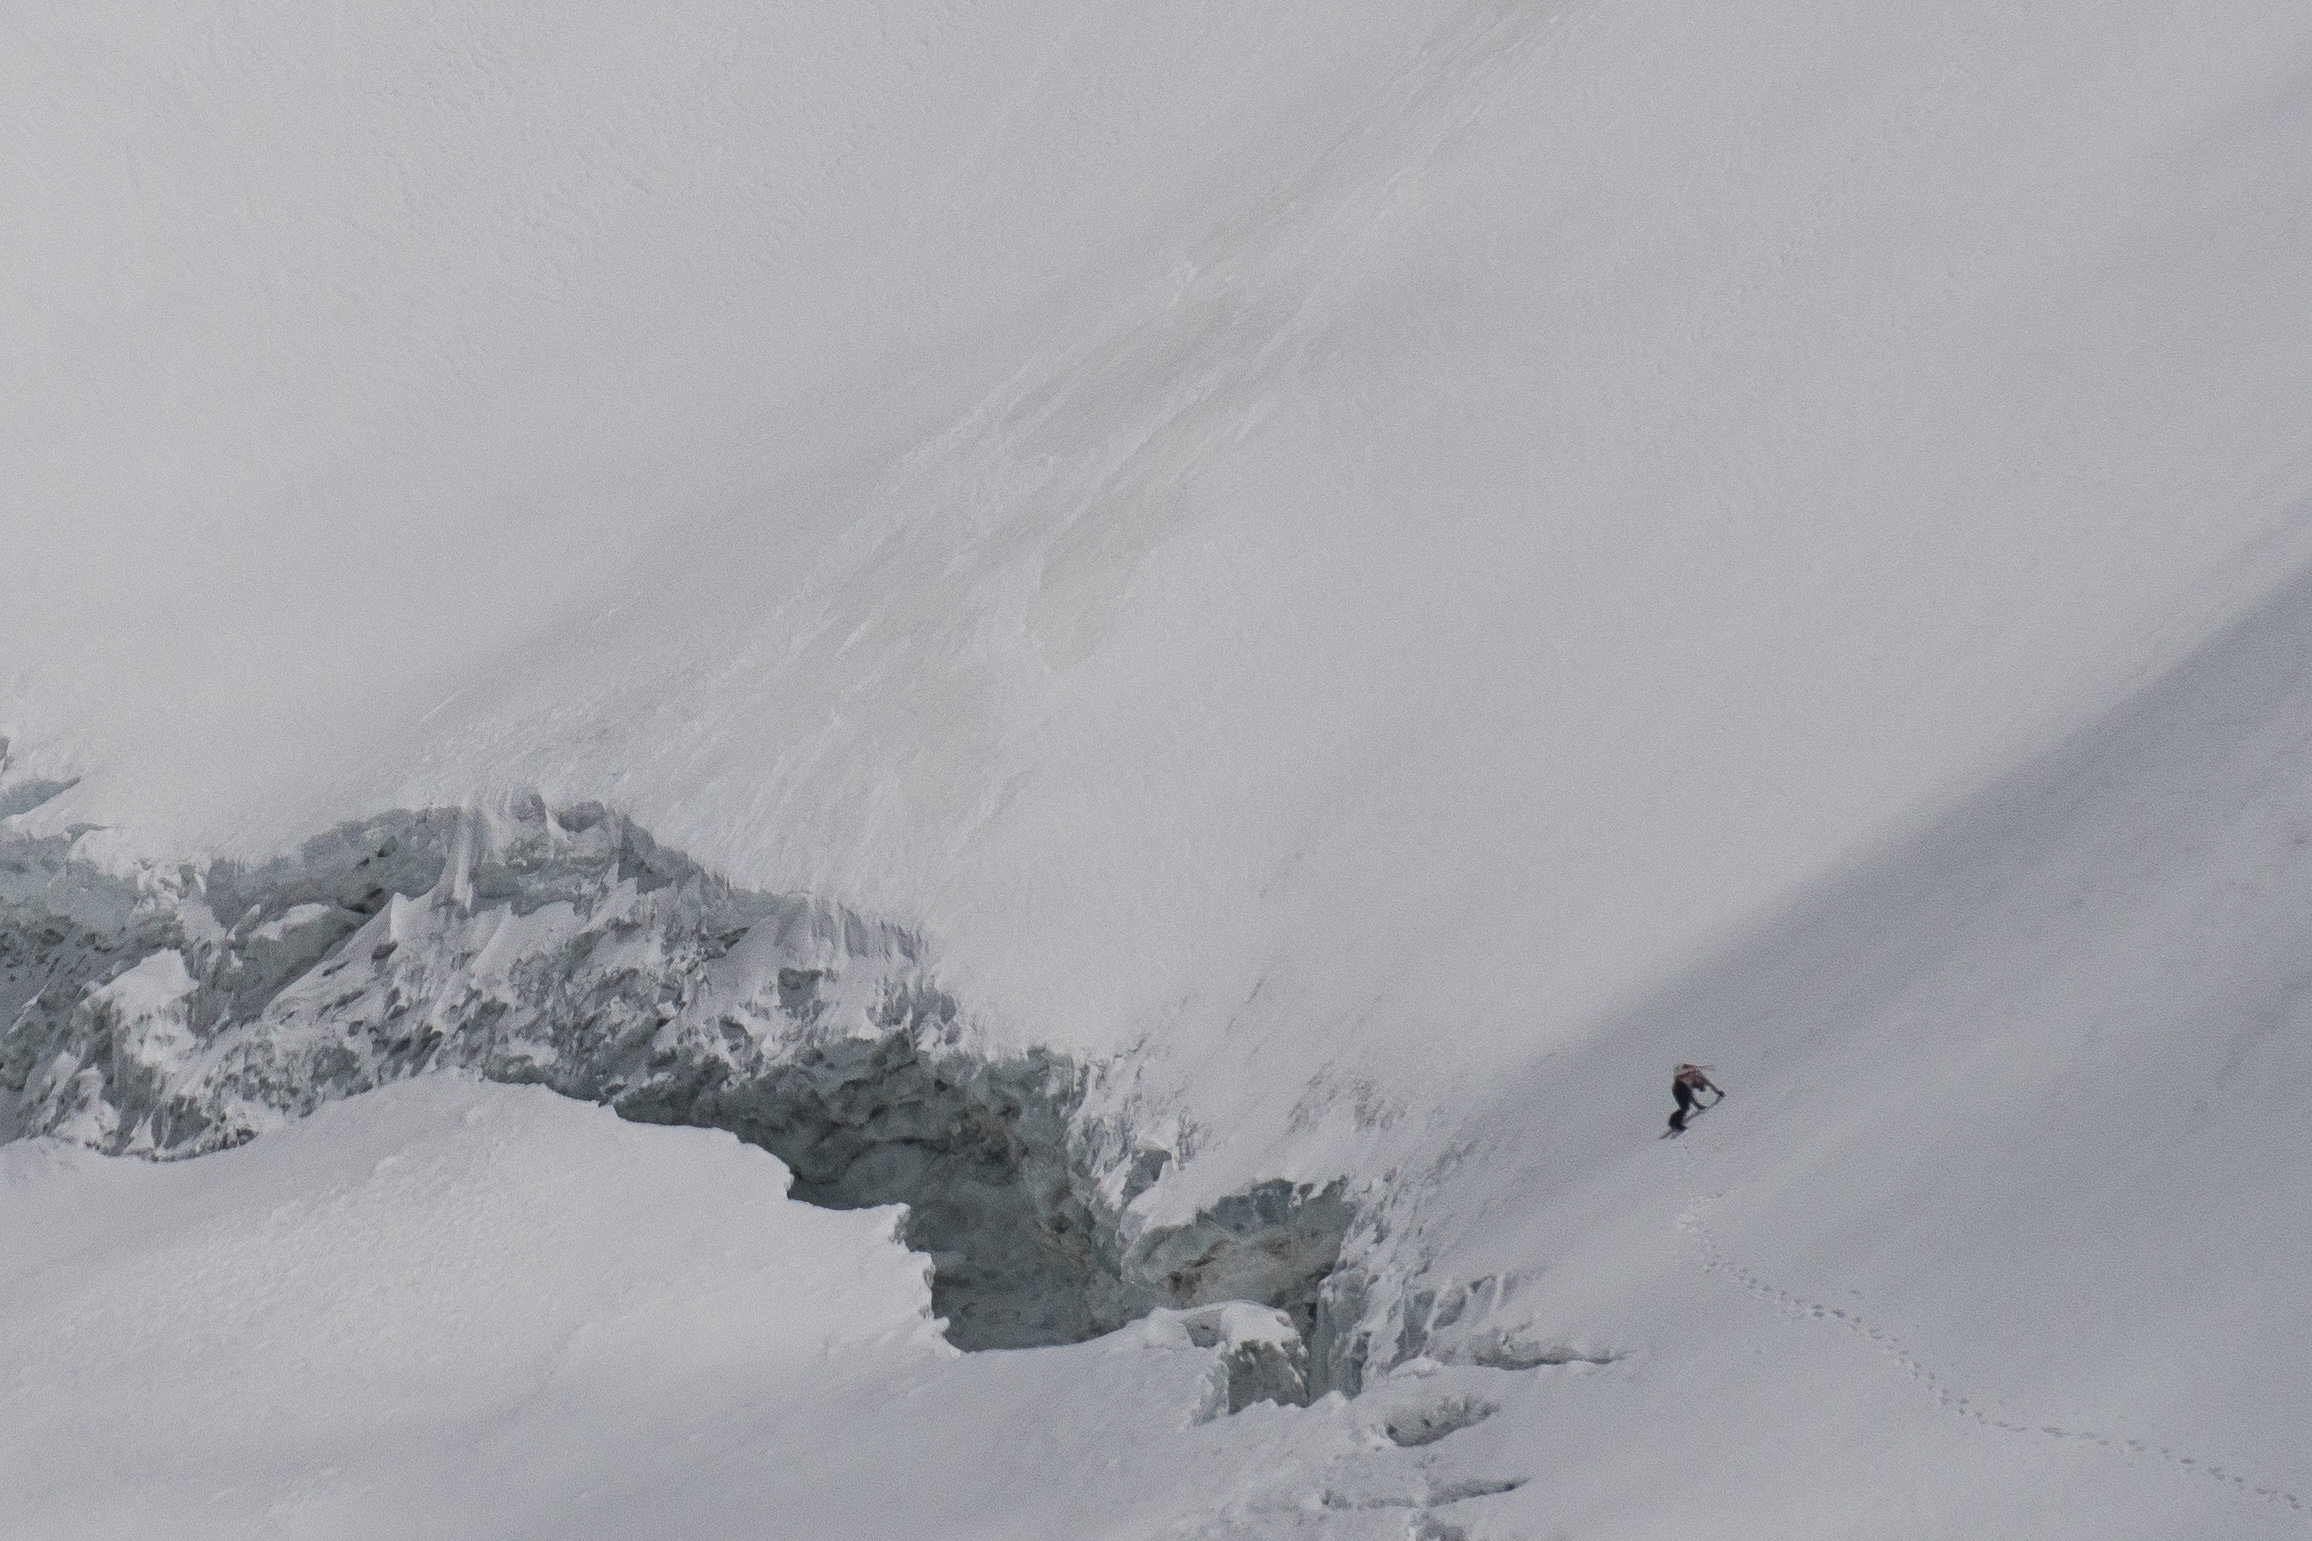 Ueli Steck climbing above the bergschrund on Sagarmāthā's South Face - 23 April 2017